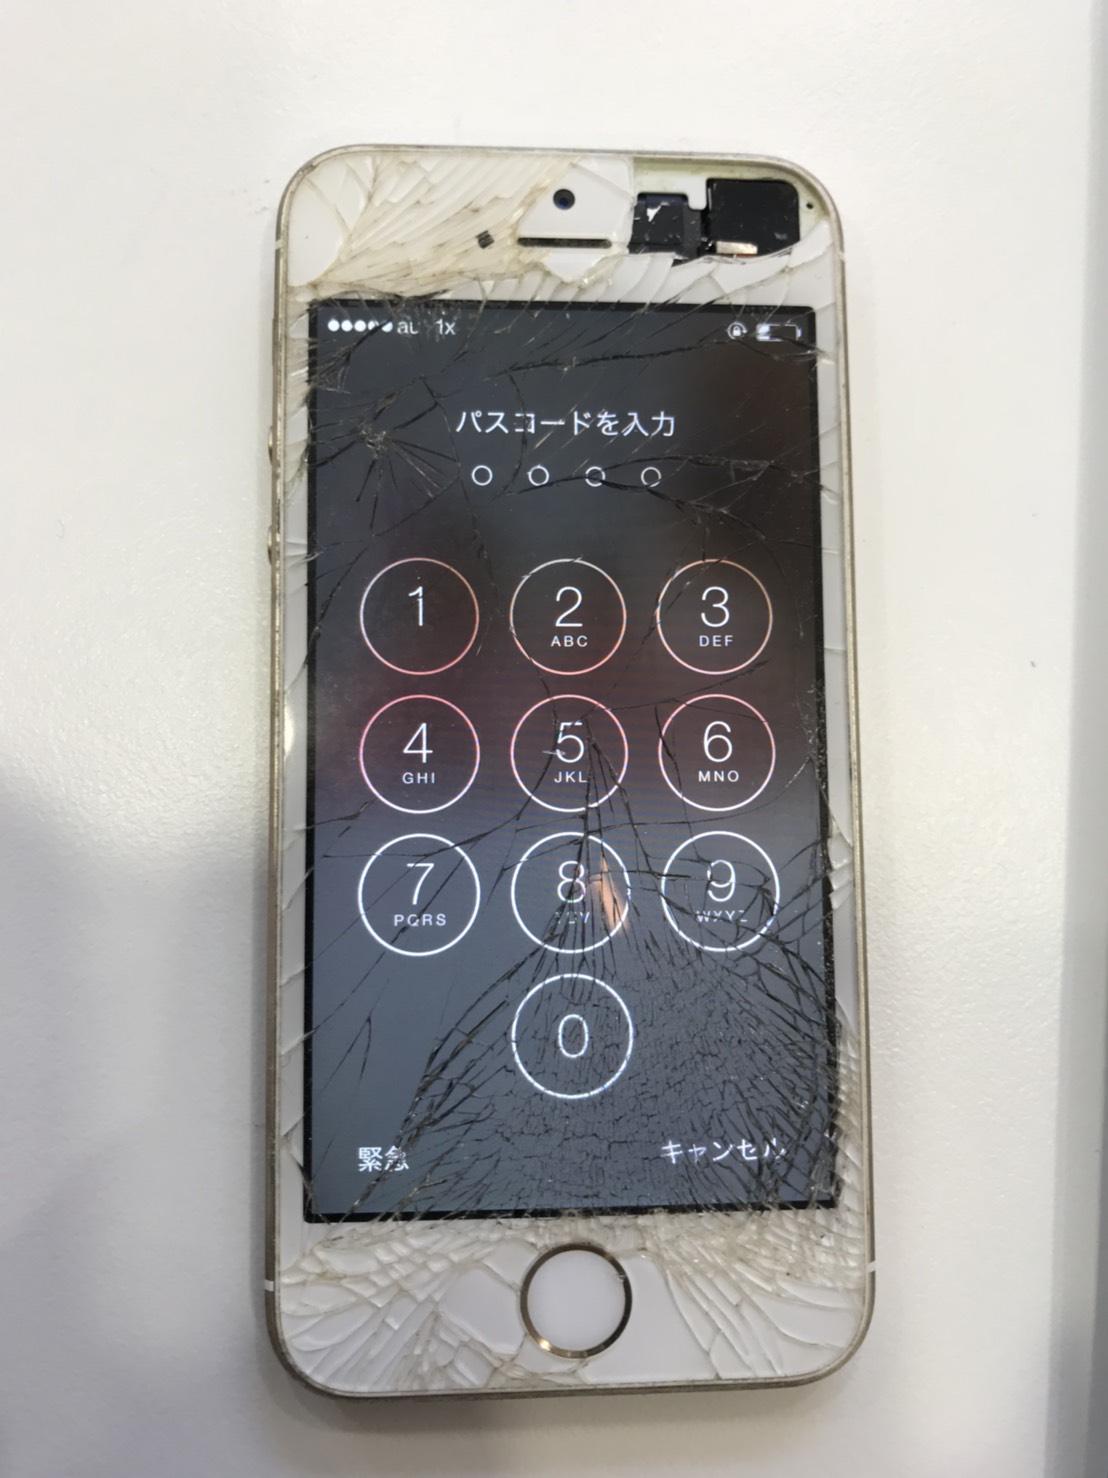 iPhone5s ガラス割れ 修理前